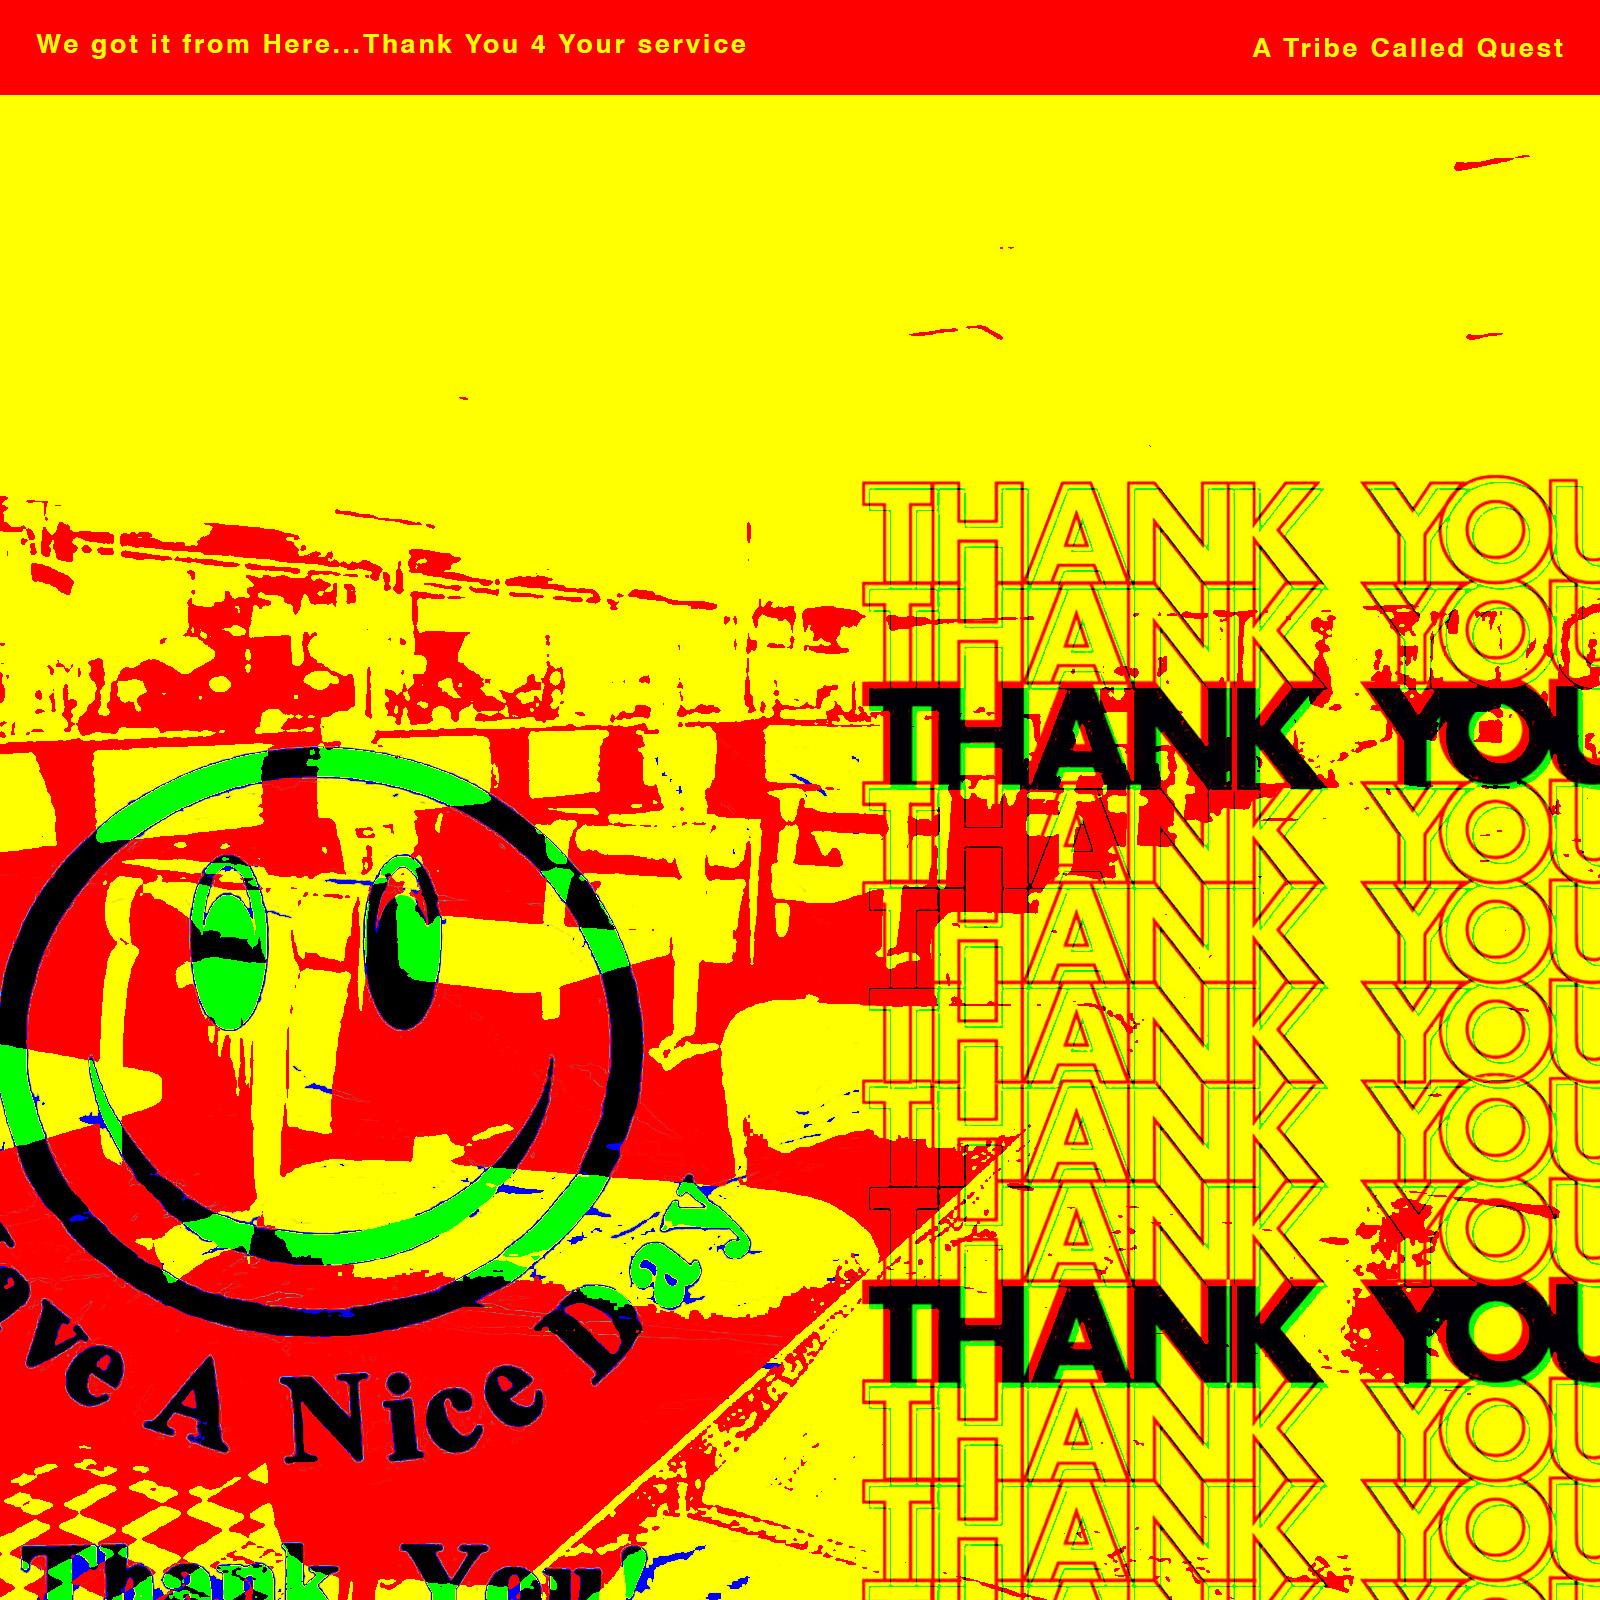 ATCQ_thankyou.jpg